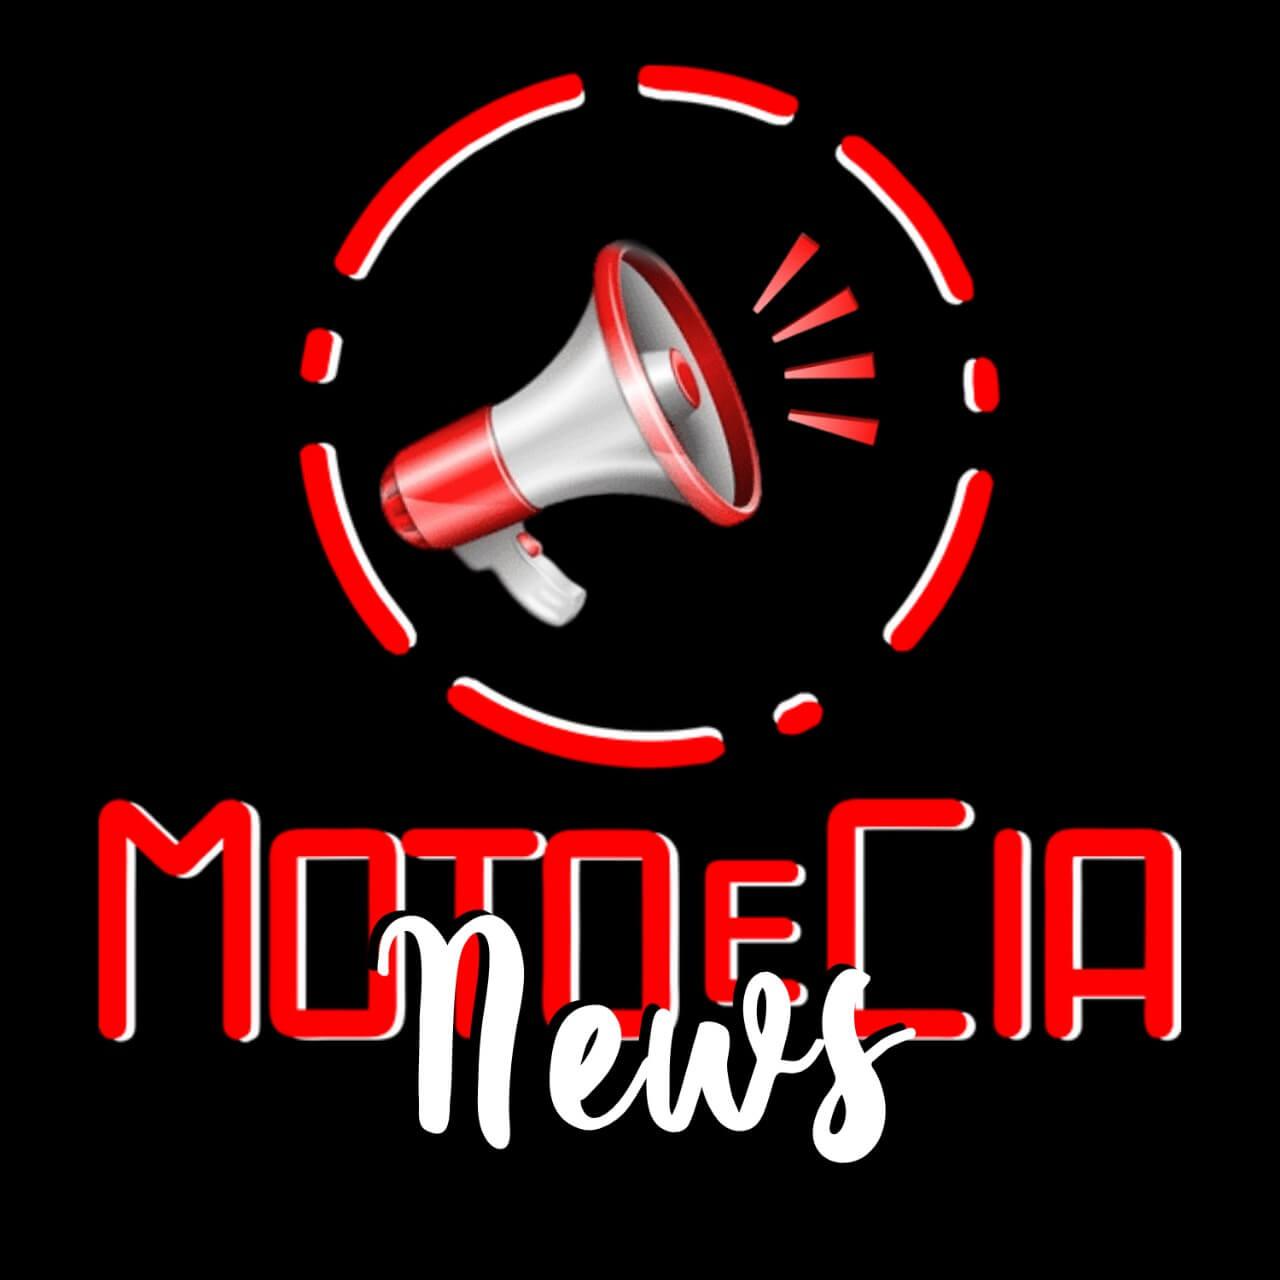 Moto e Cia News